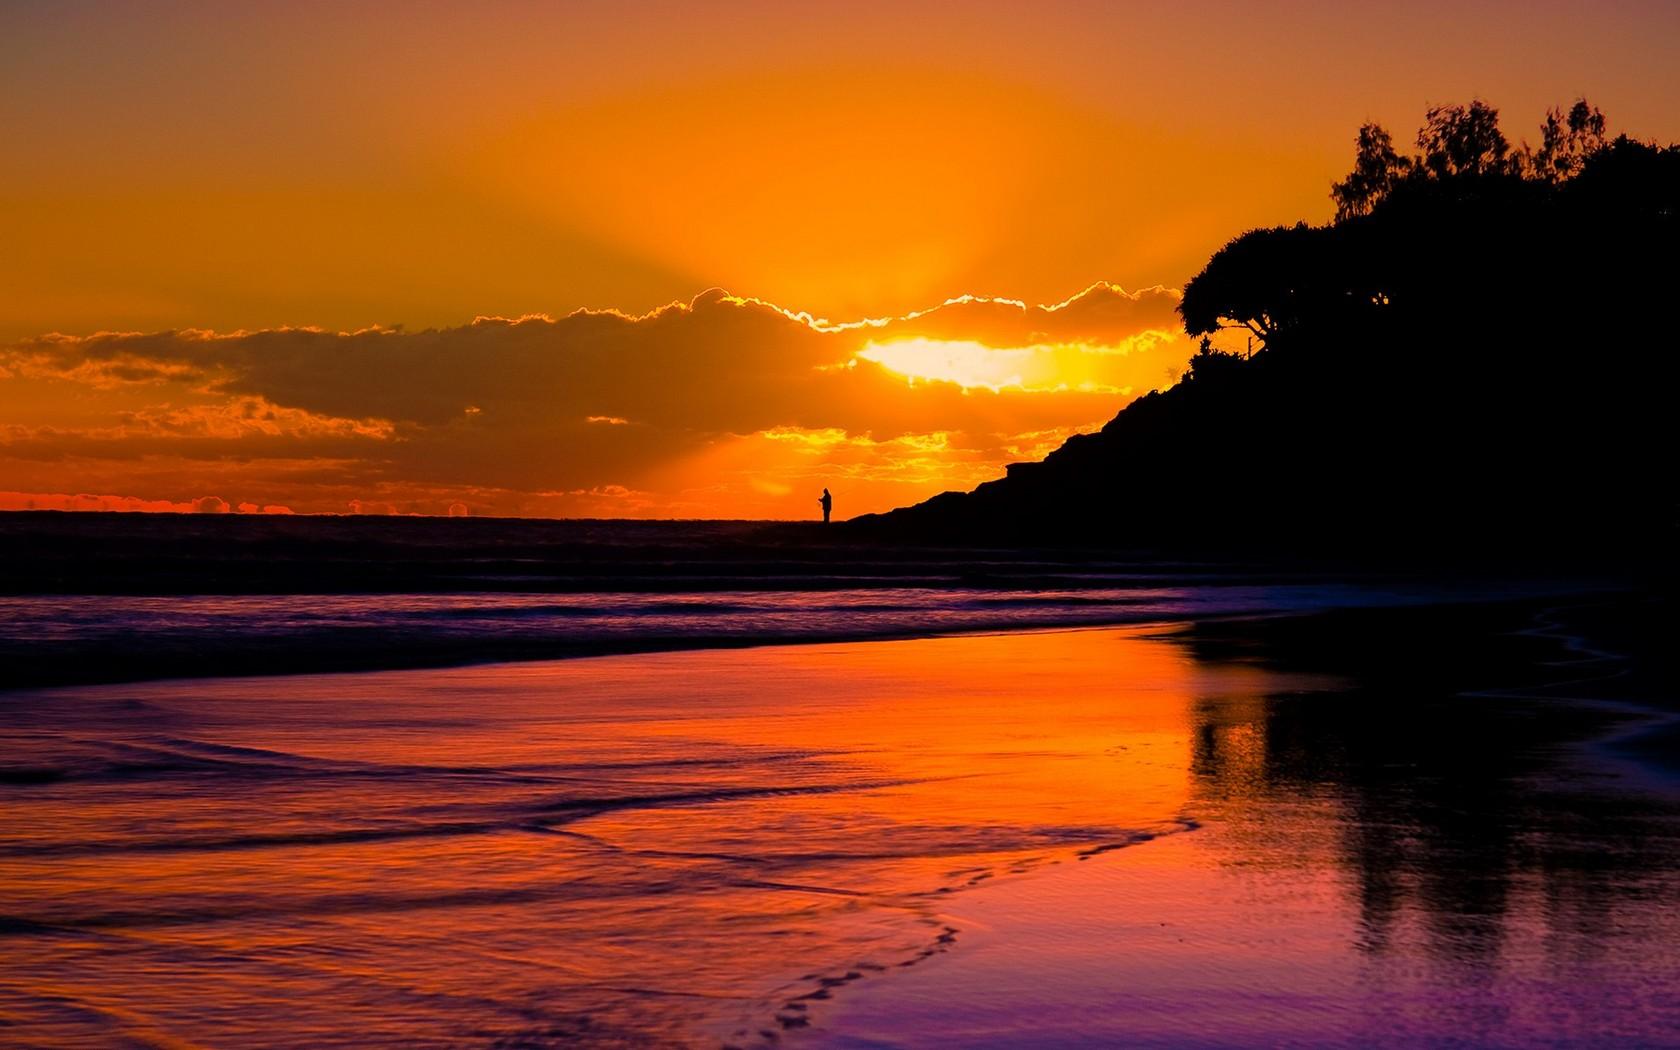 43+ Beach Sunset HD Wallpaper on WallpaperSafari